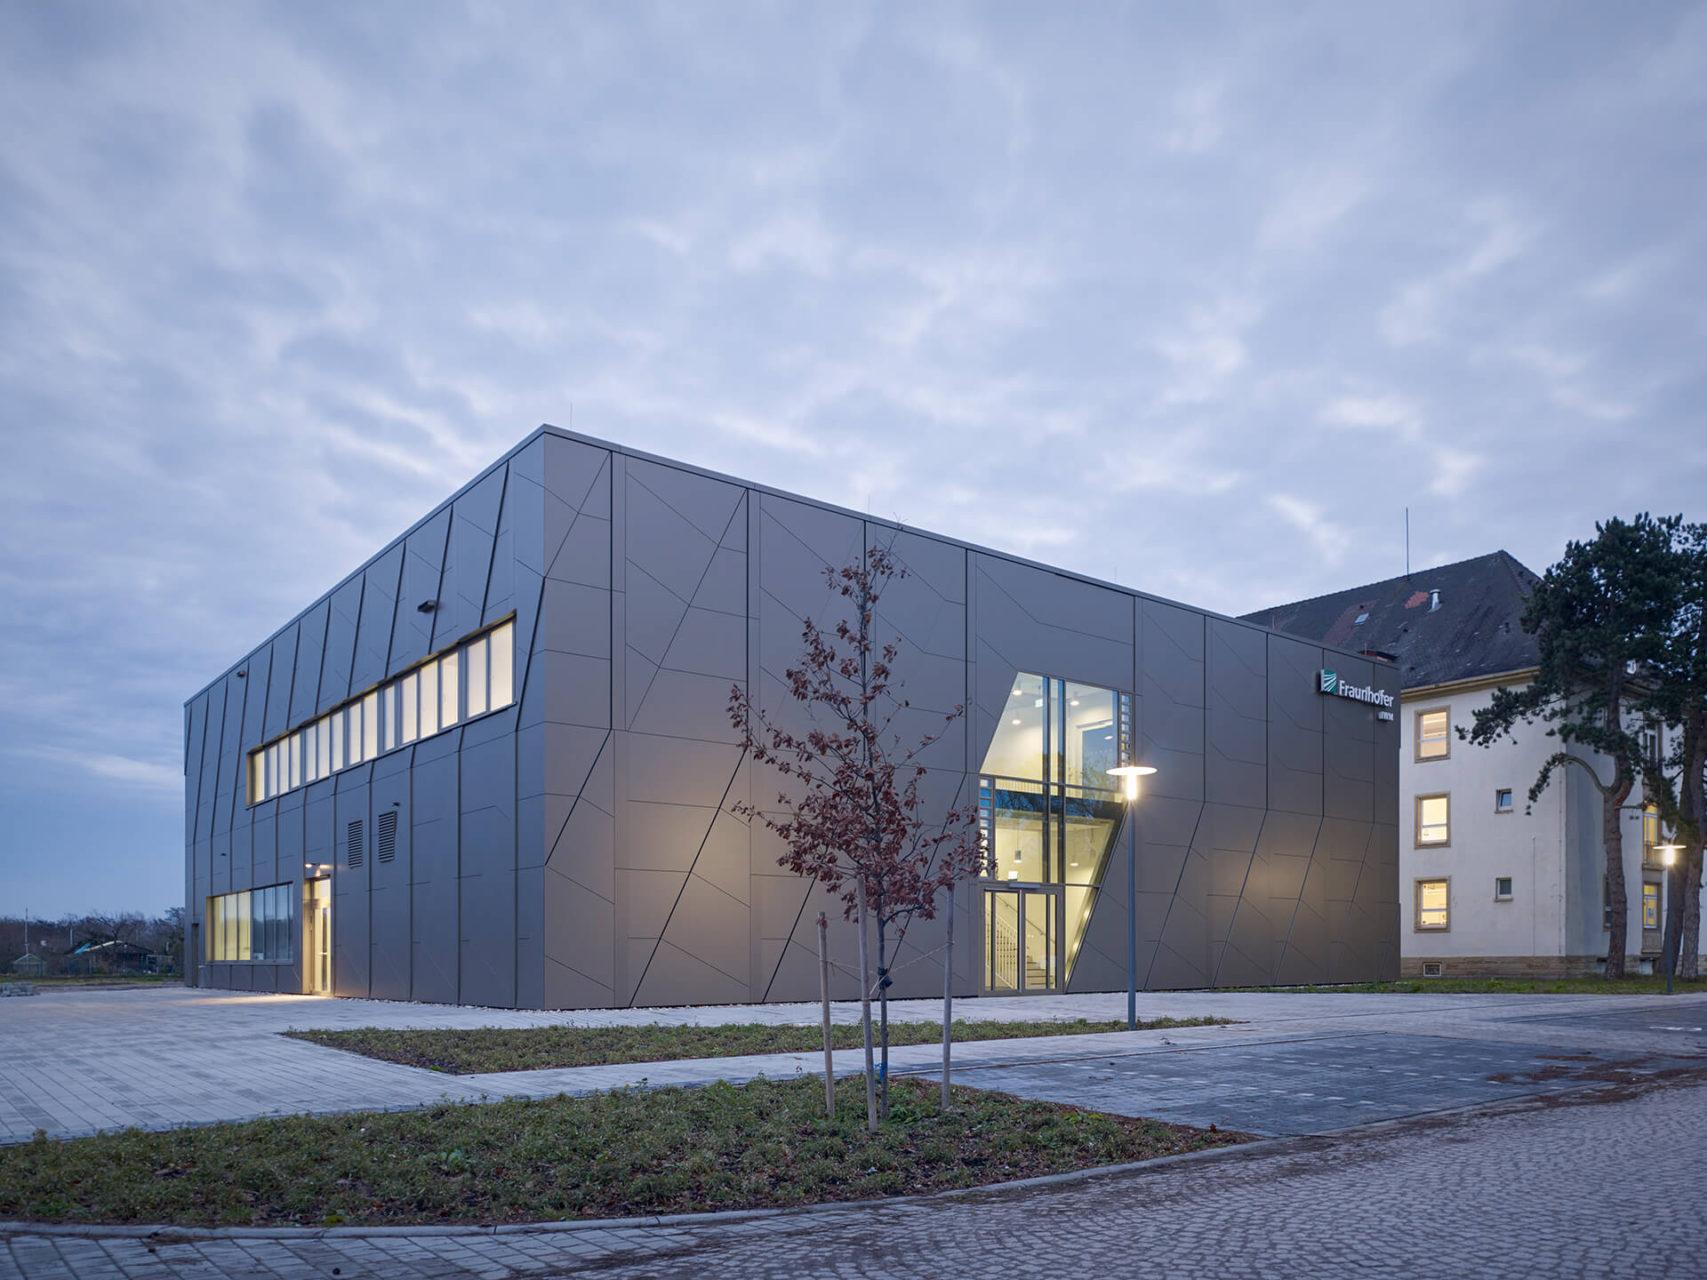 Frauenhofer Institut Karlsruhe